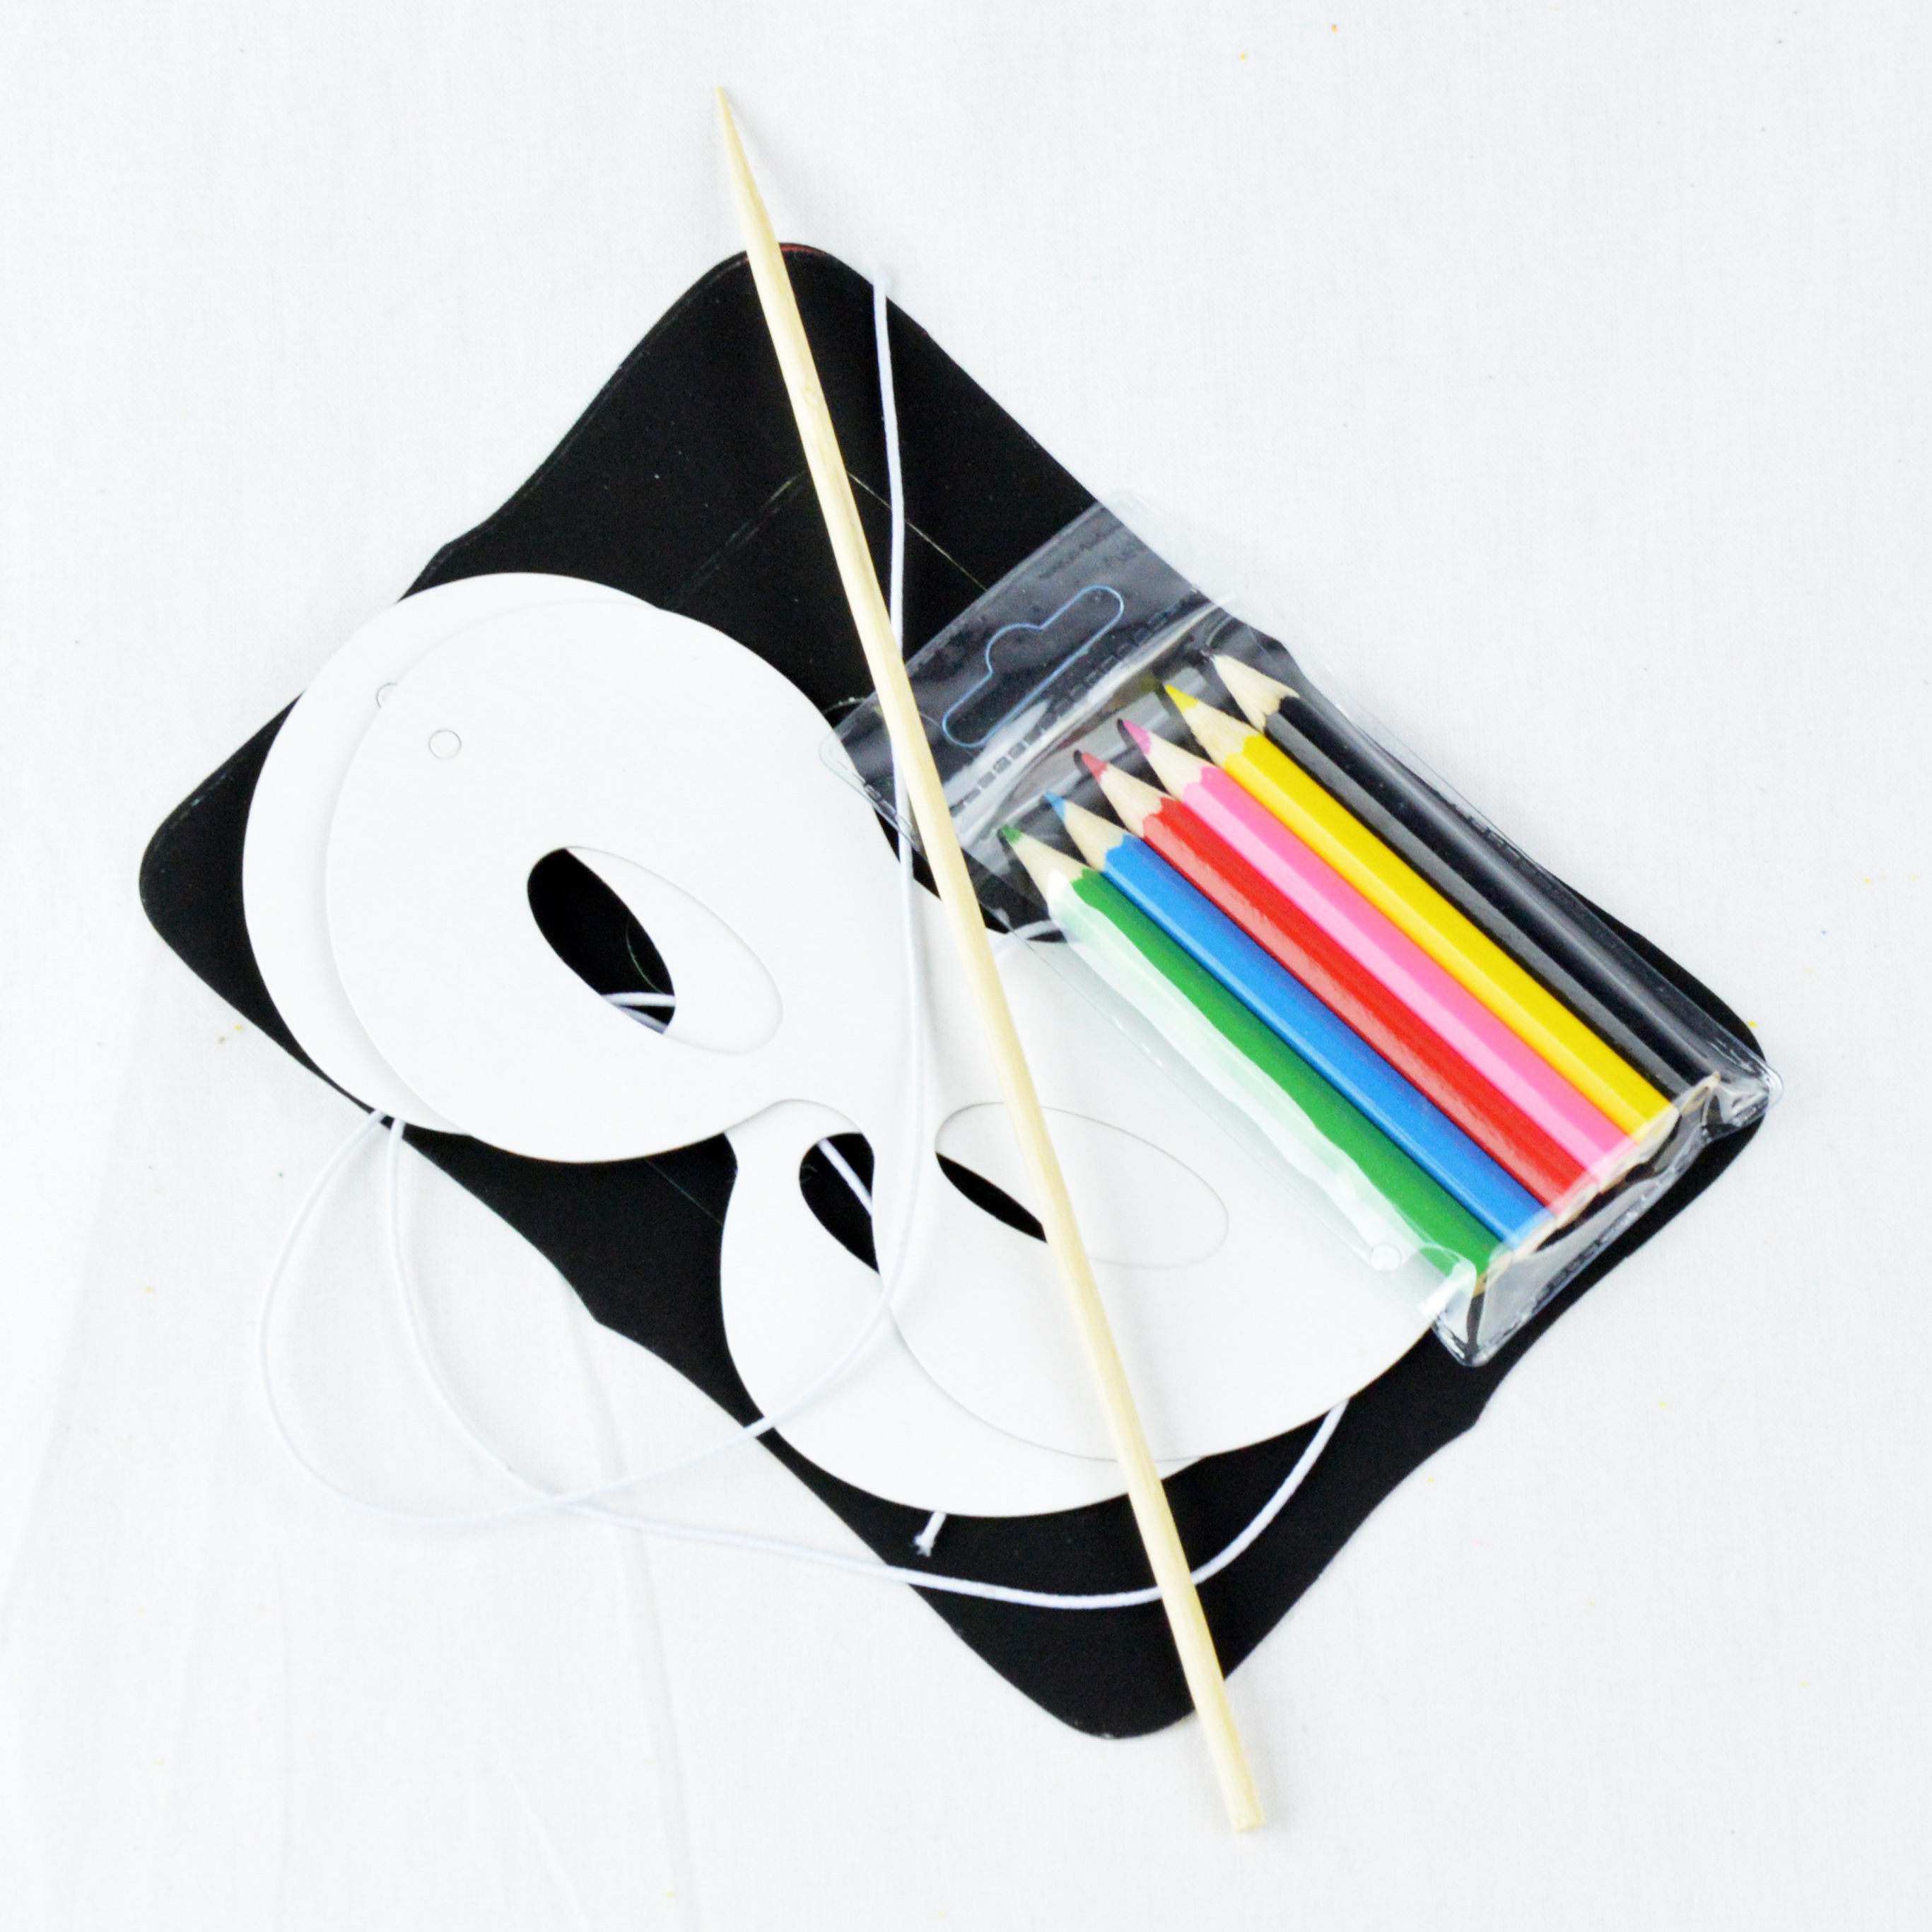 Großzügig Vintage Draht Kunst Kits Ideen - Schaltplan Serie Circuit ...